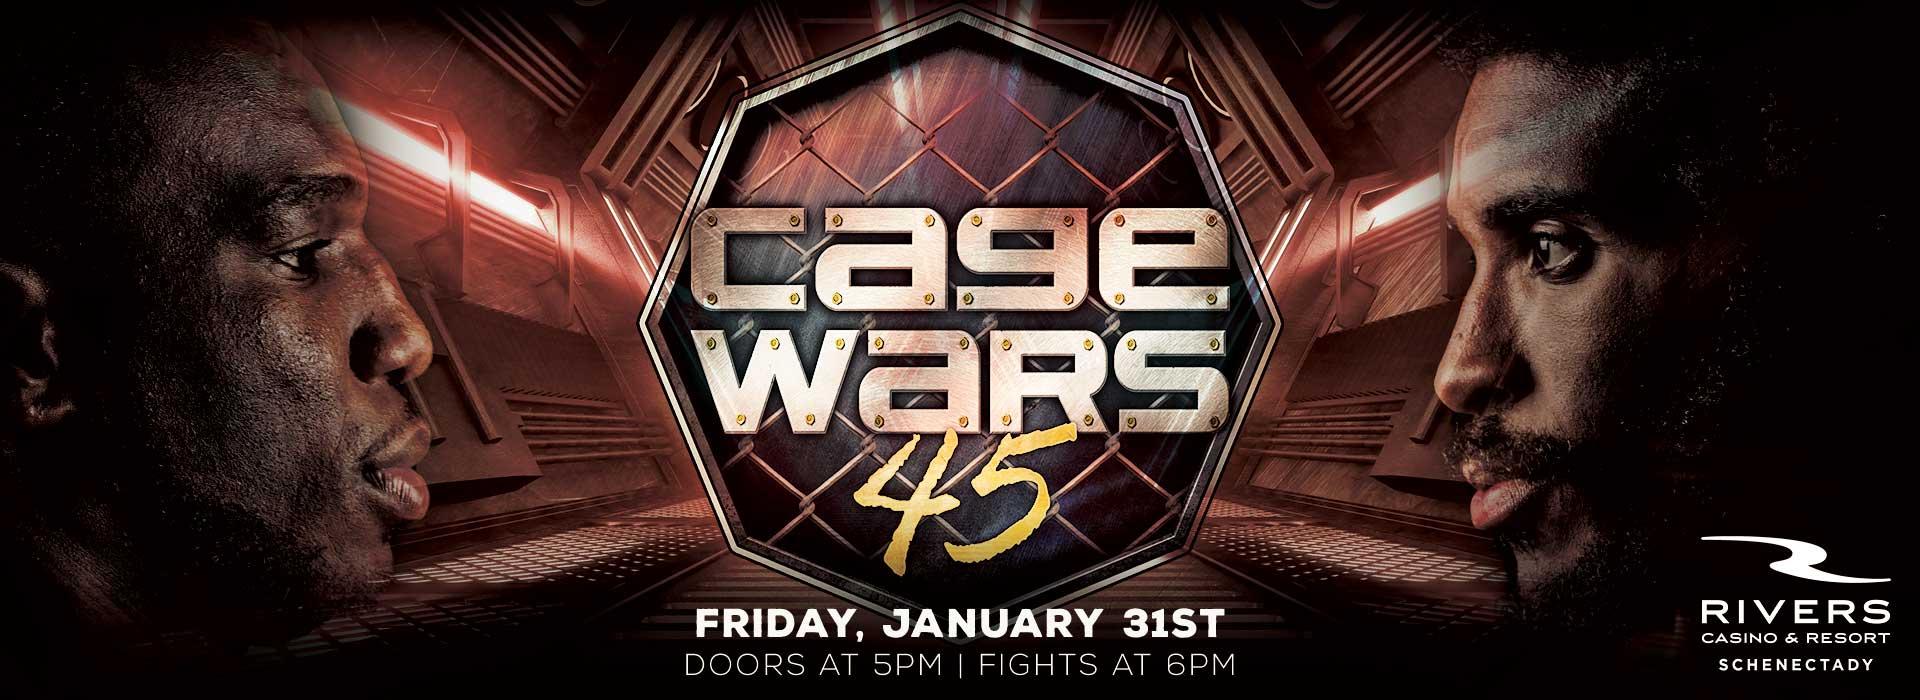 Cage Wars 45 Tickets